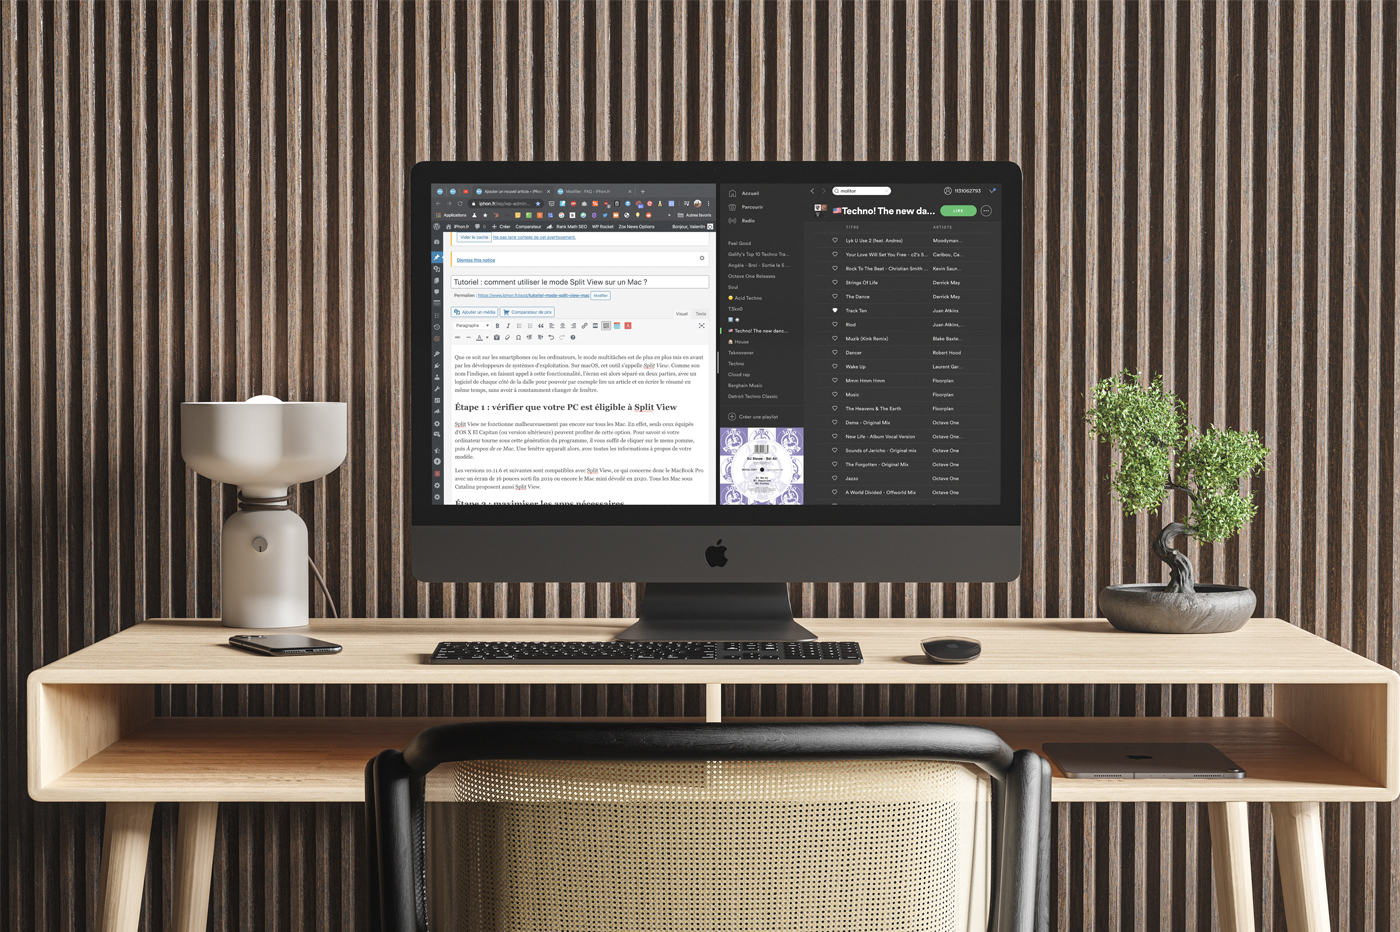 Tutoriel Split View Mac